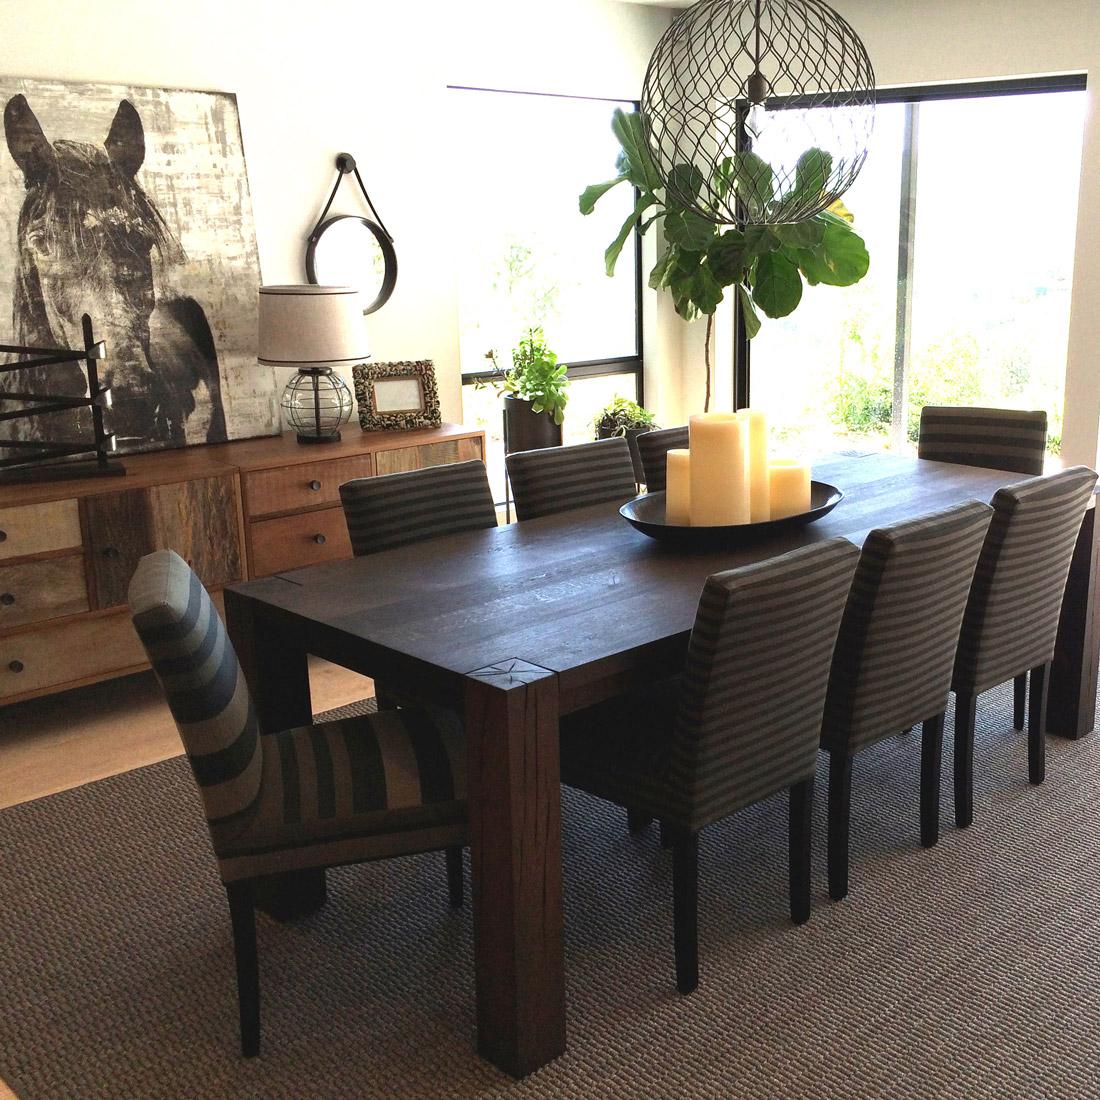 Sara bates interior design dine for Wood dining table centerpiece